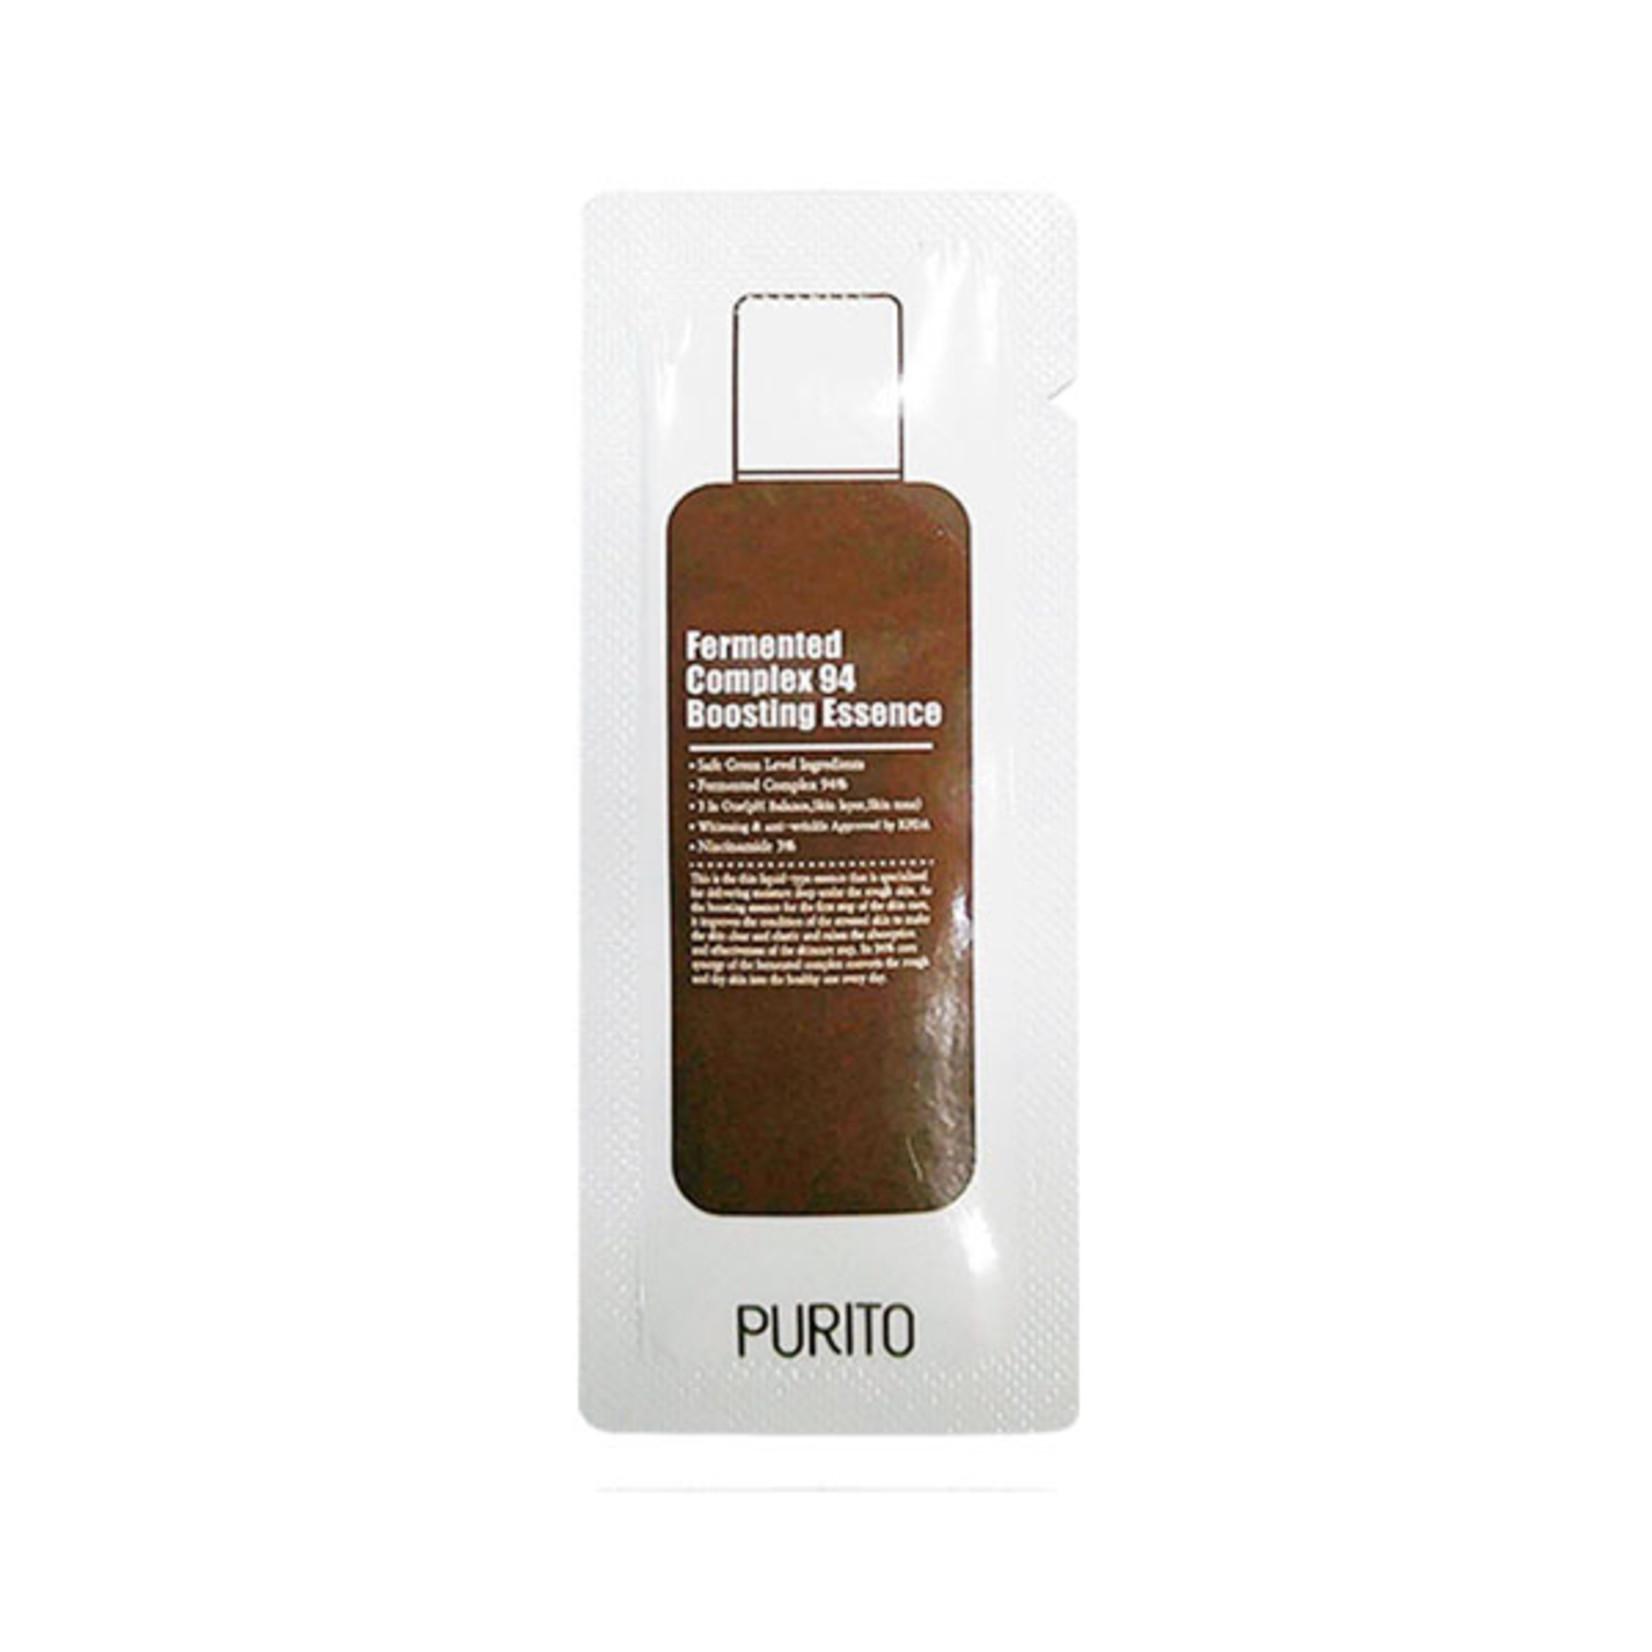 Purito Fermented Complex 94 Boosting Essence Sample 50pcs